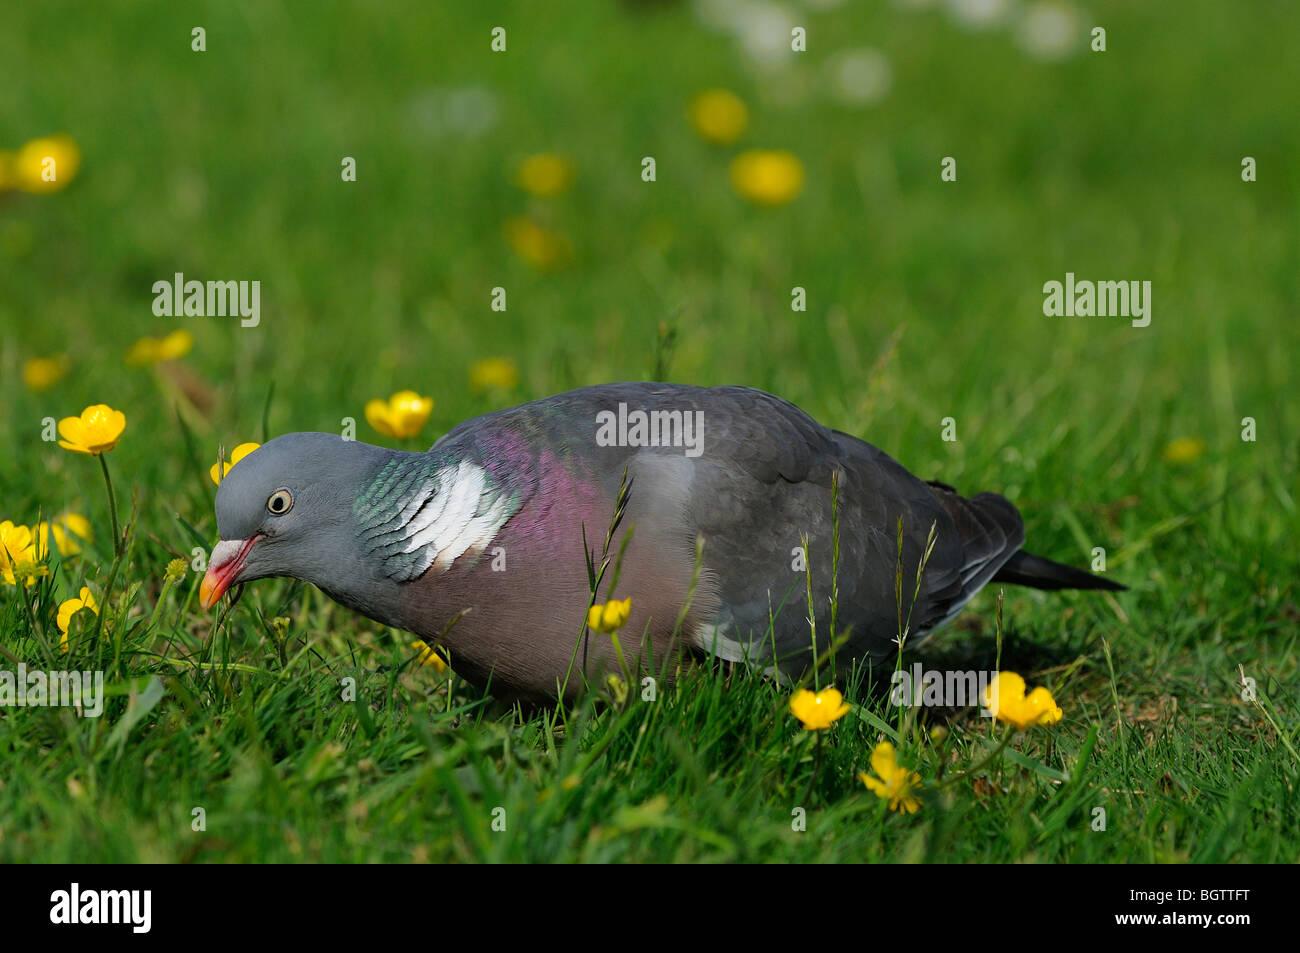 Woodpigeon (Columba palumbus) feeding on the groung amongst buttercups, Oxfordshire, UK. - Stock Image